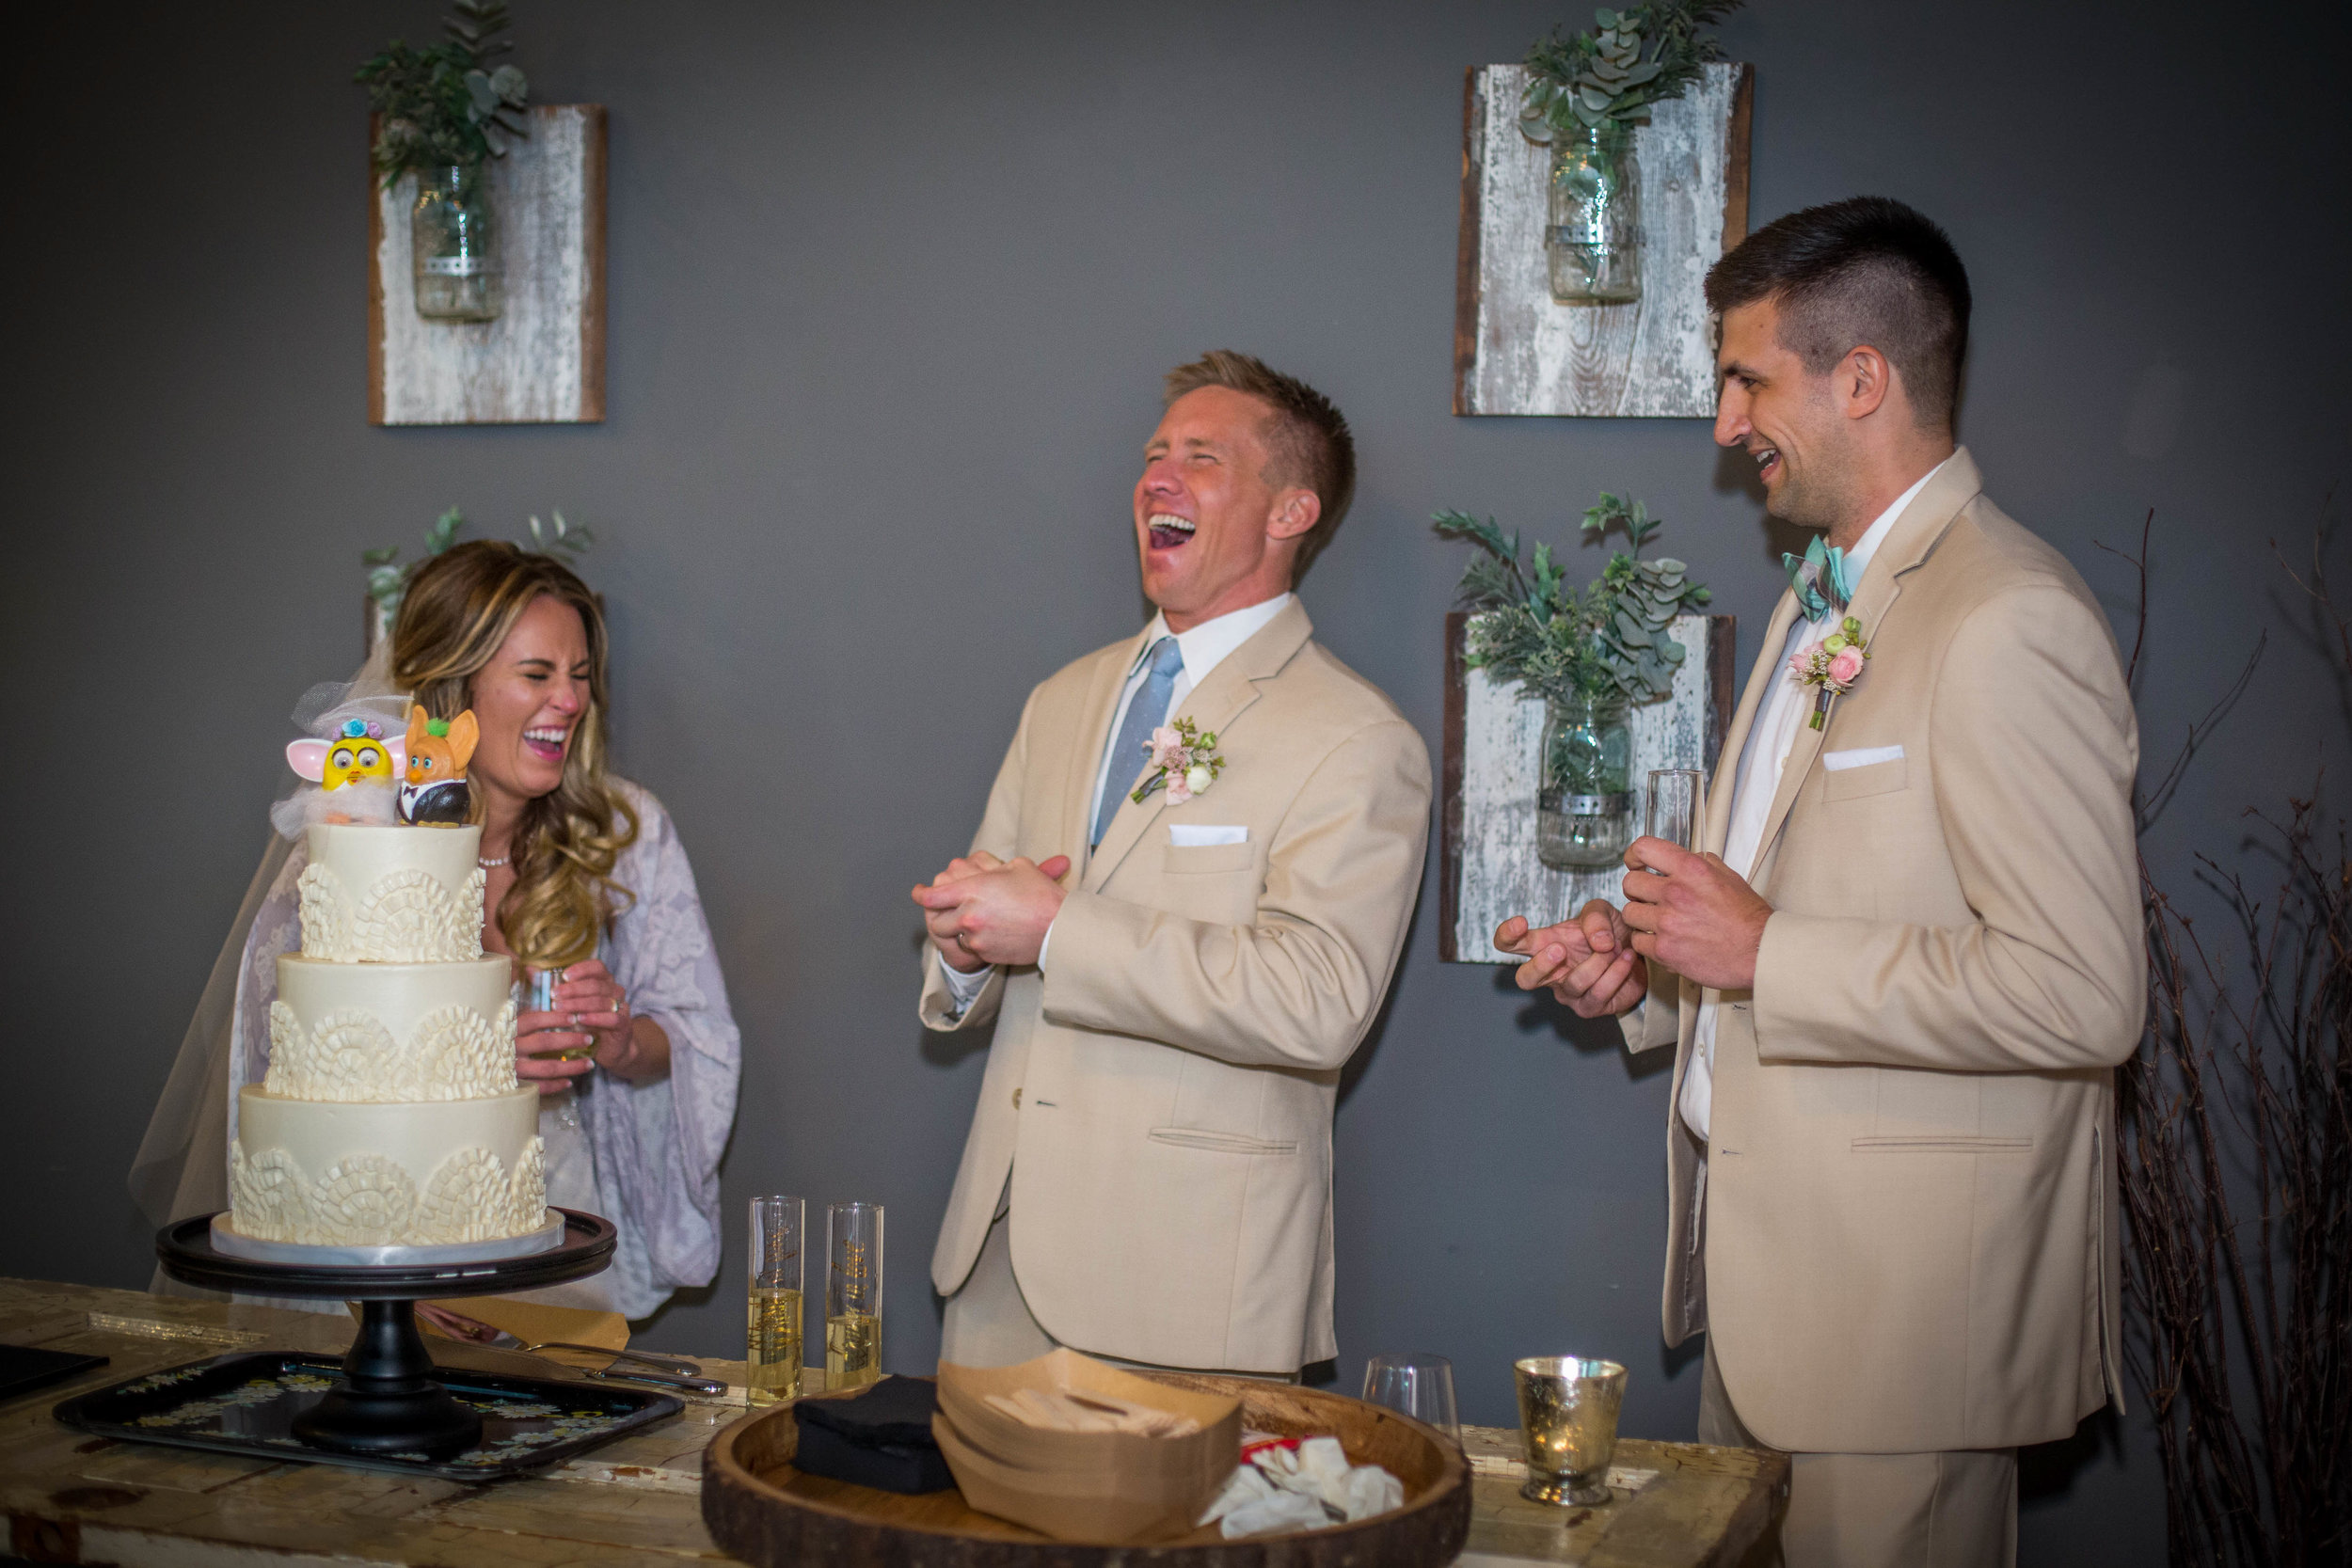 Kansas+City_Small+Wedding_Elope_Intimate_Ceremony_Best+Friends_Megan & Jeff-204.jpg